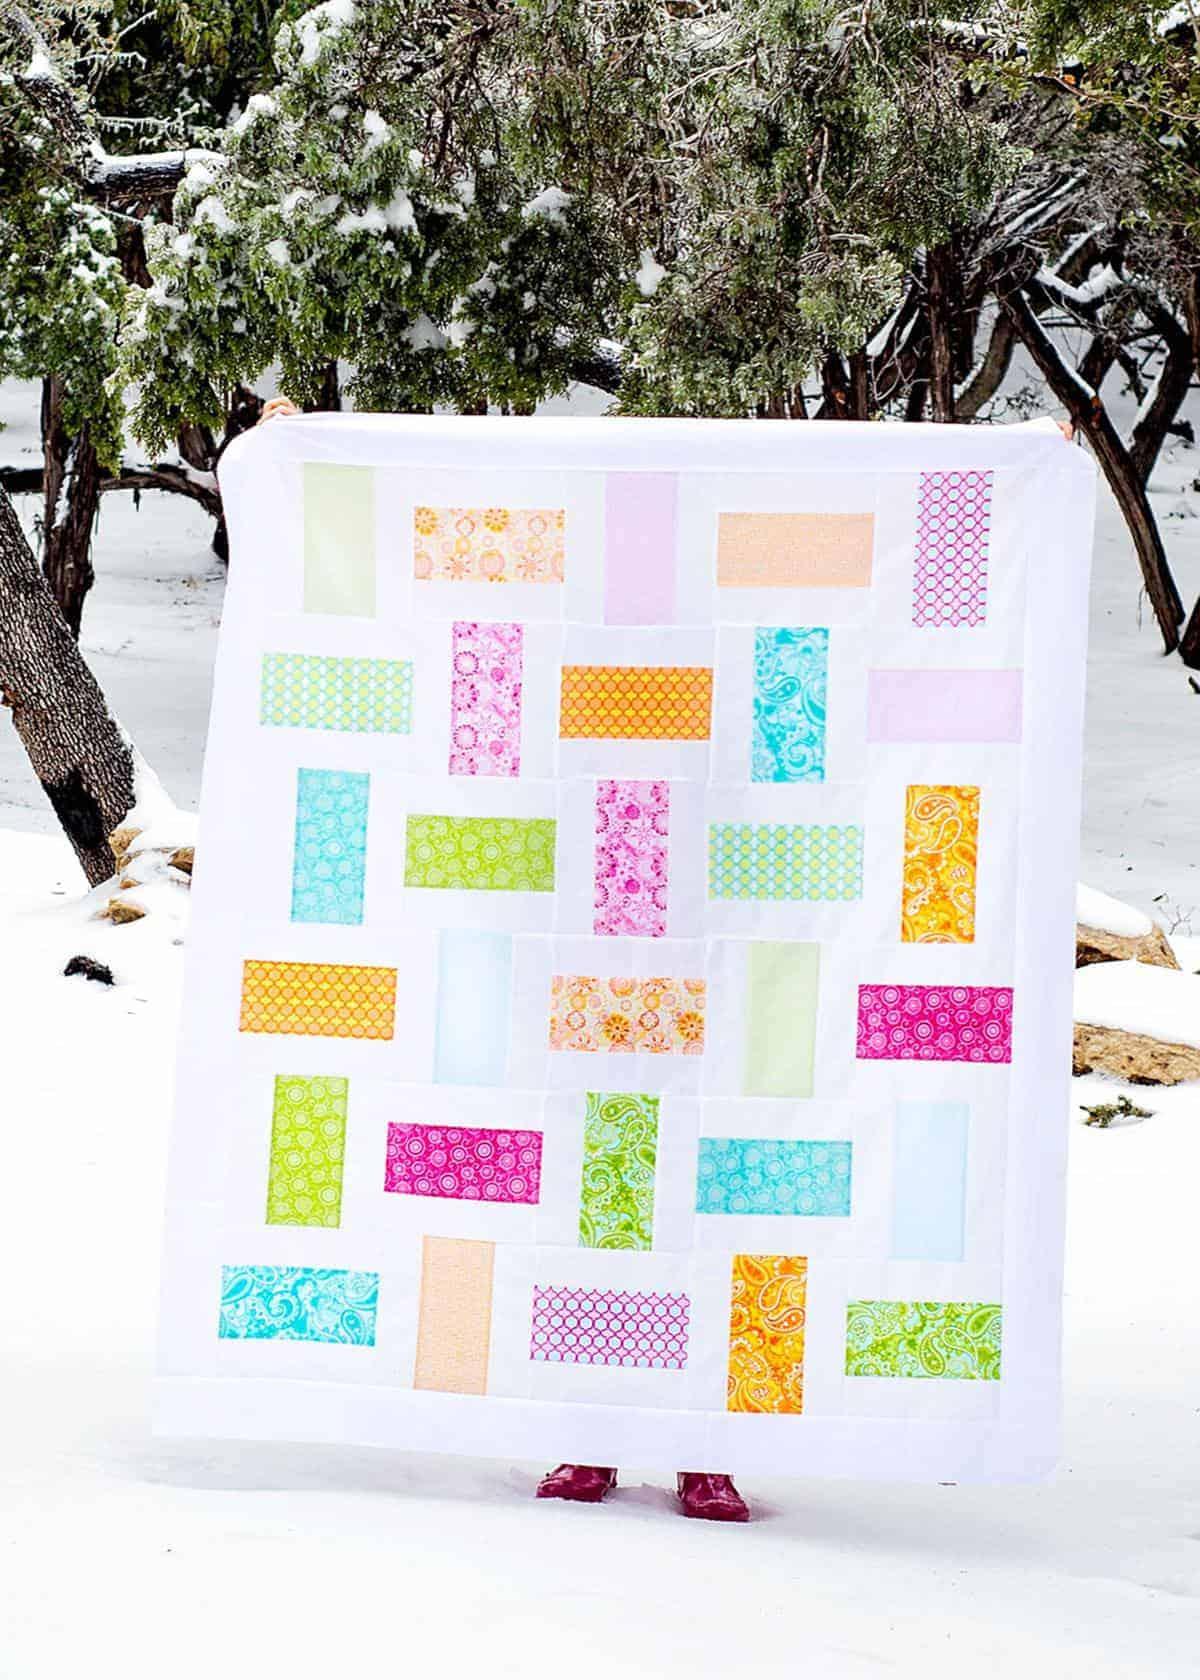 Basket Weave Quilt Pattern : basket, weave, quilt, pattern, Simple, Basket, Weave, Quilt, Pattern, (using, Layer, Cake), Scattered, Thoughts, Crafty, Jamie, Sanders